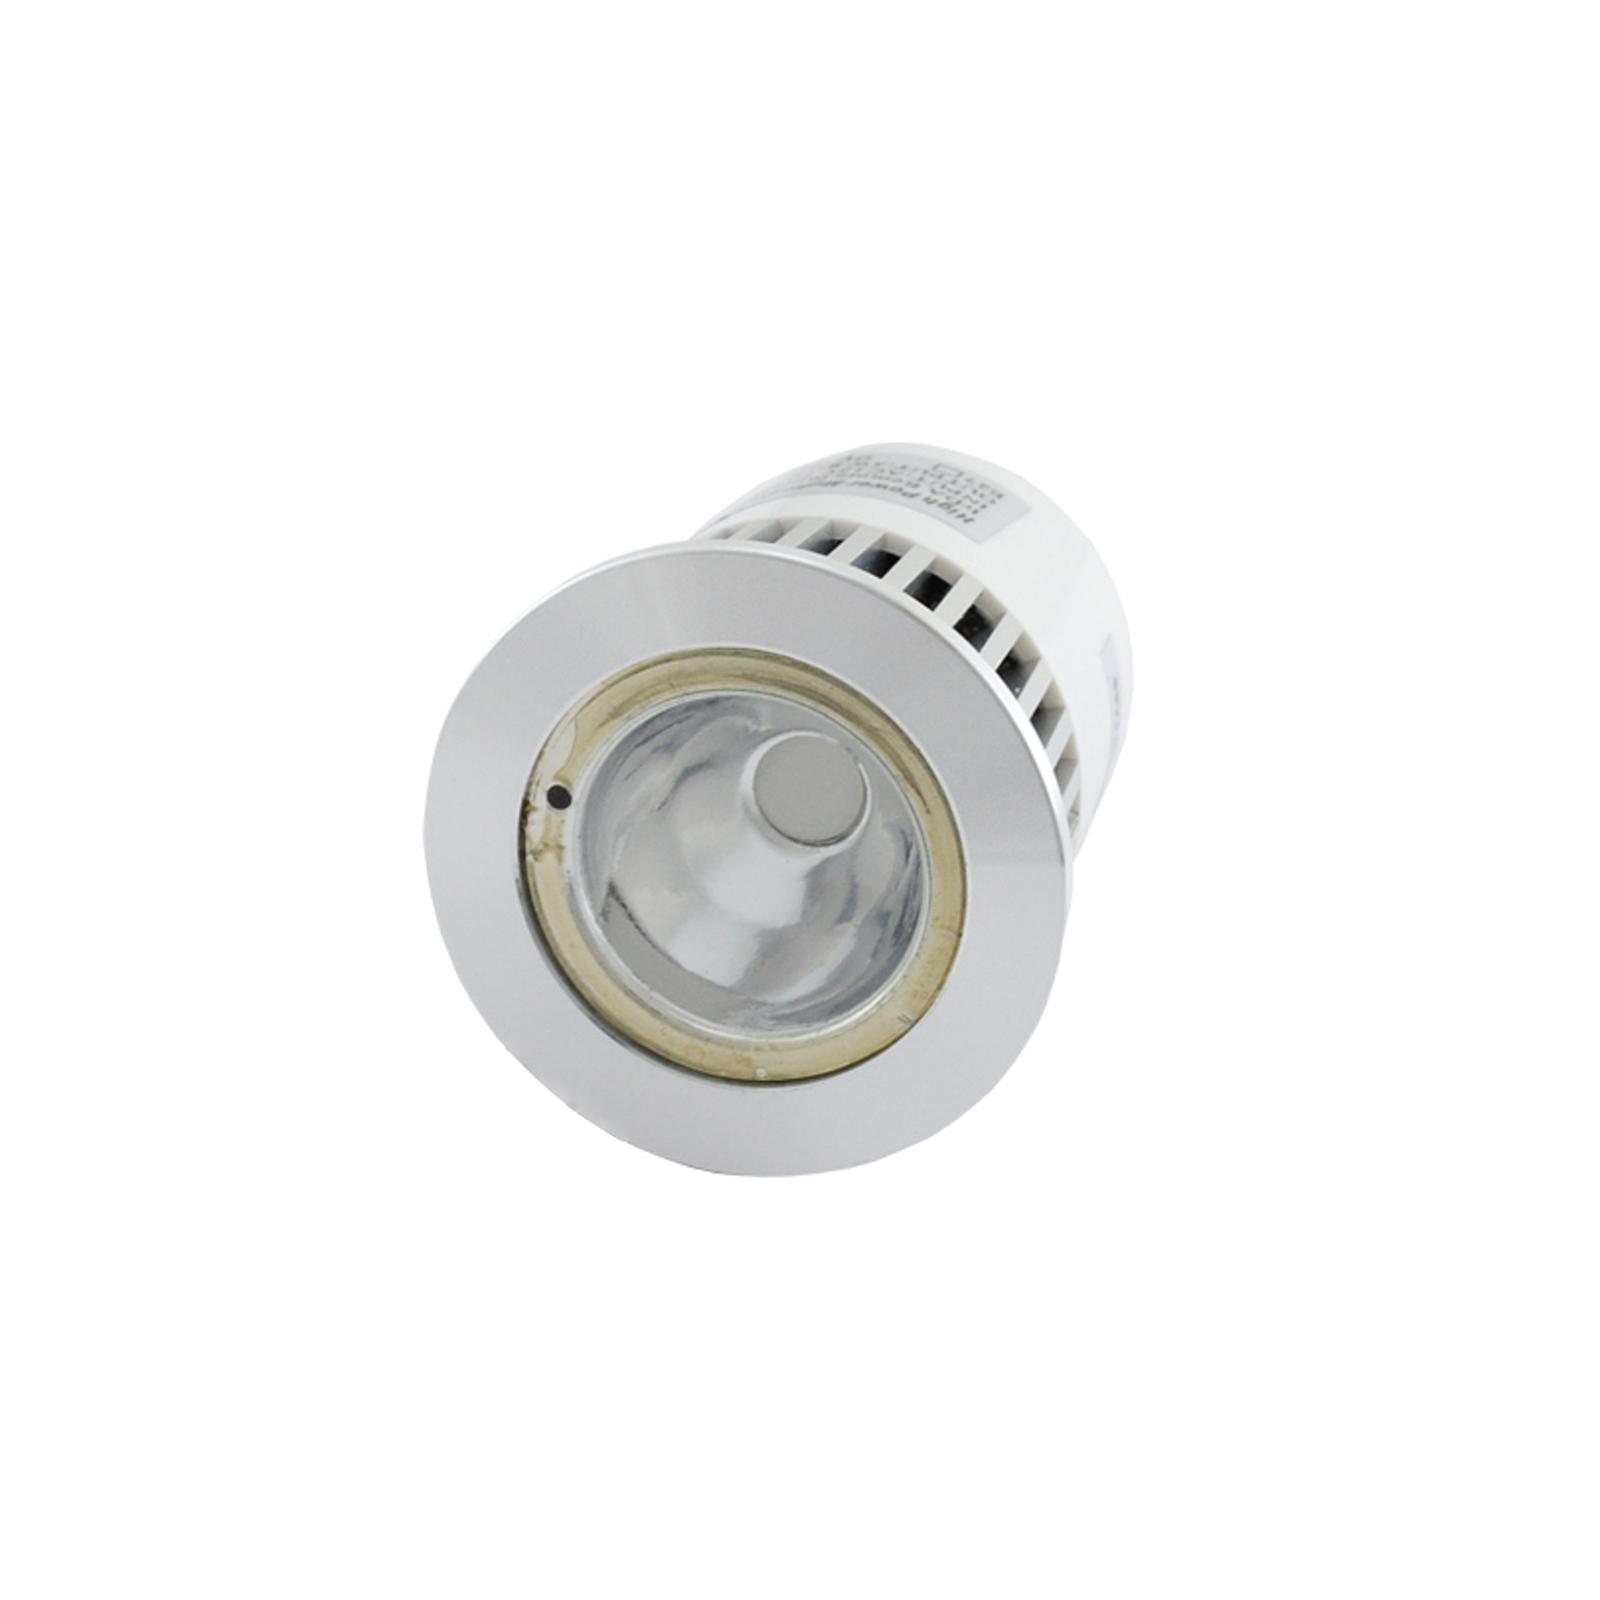 Strahler led lampe mr16 rgb 5w farbtherapie licht 12v mit spotlight led lampe mr16 rgb 5w chromotherapy 16 12v licht fernbedienung farbe parisarafo Choice Image